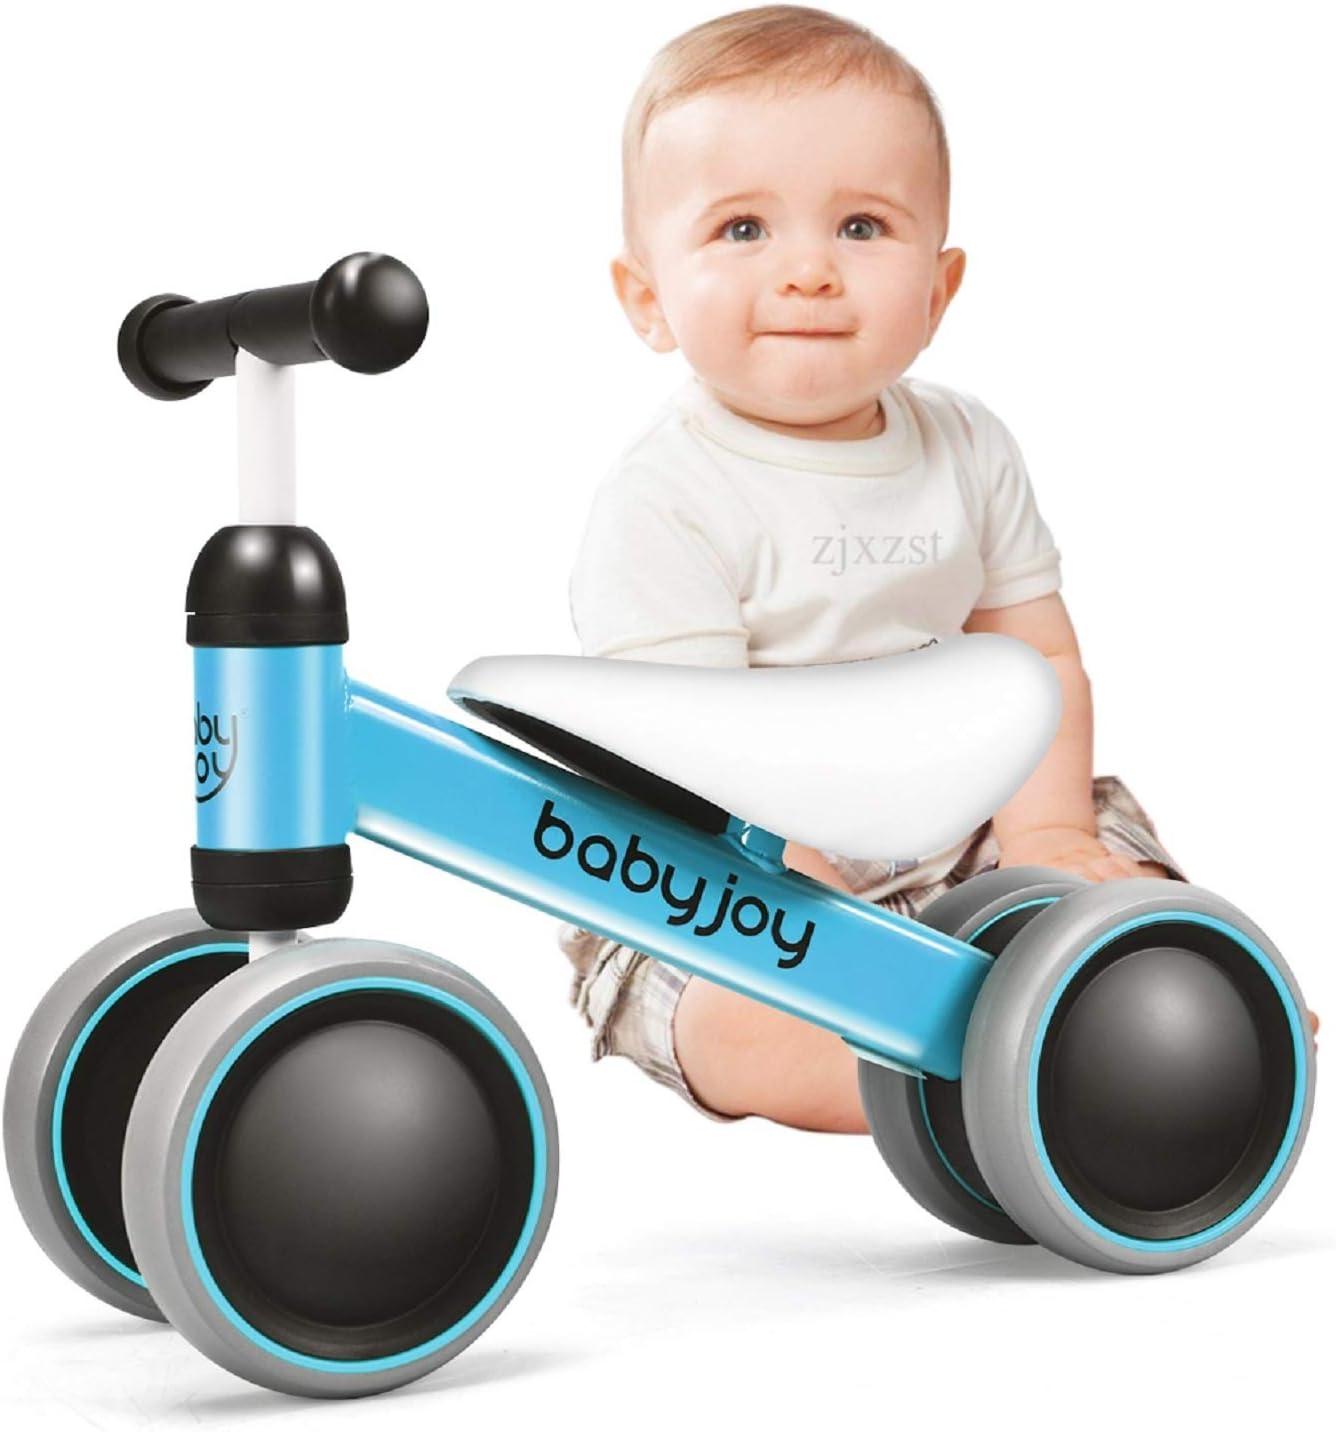 BABY Cheap bargain JOY Baby free shipping Balance Bikes Children Walker Bicycle Toddl